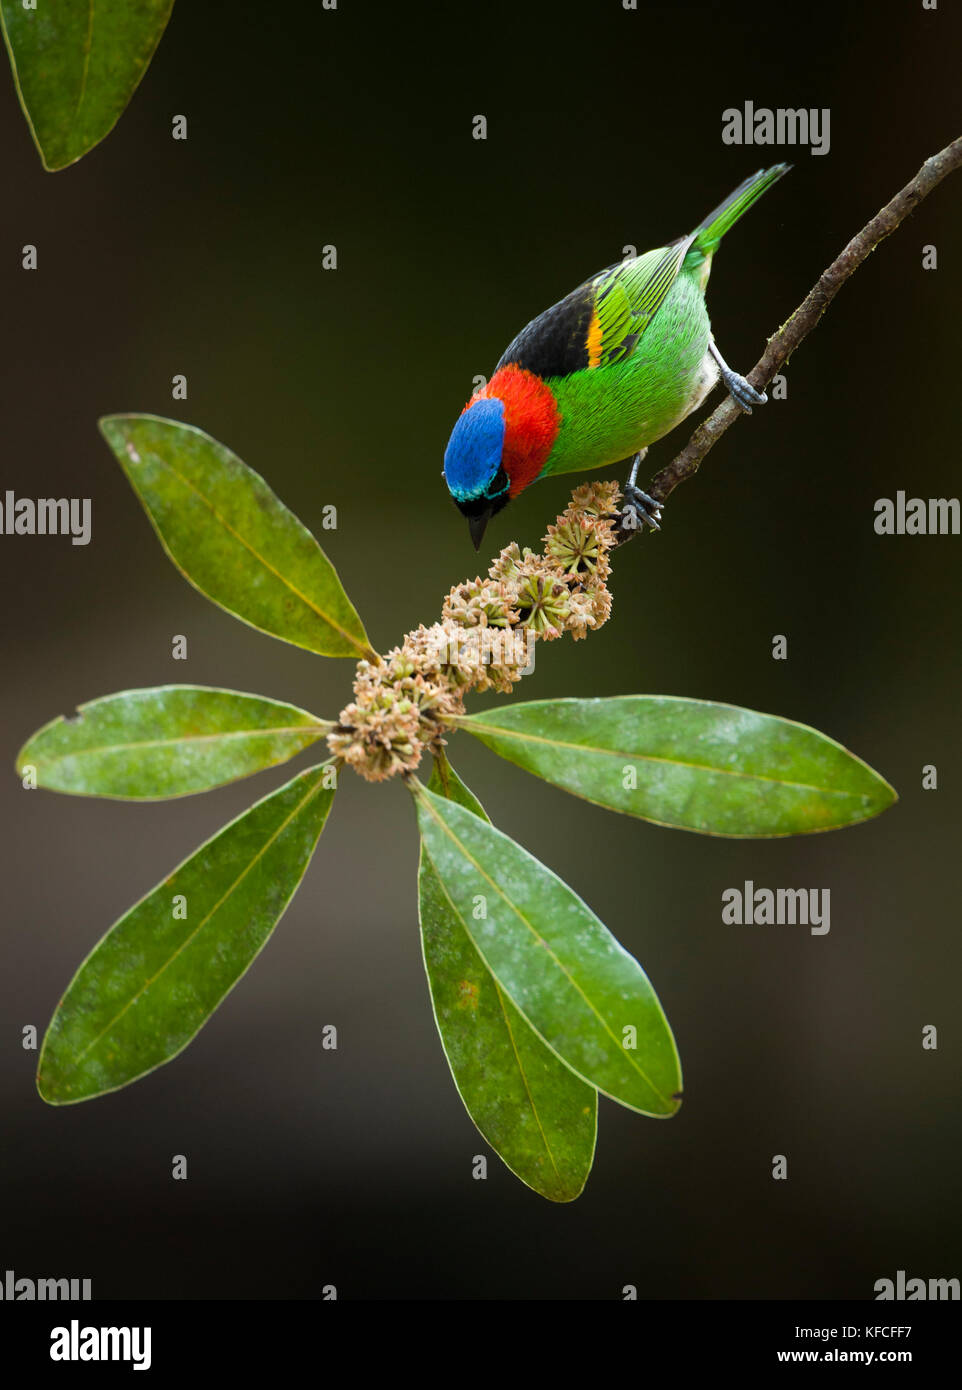 Red-necked tanager (Tangara cyanocephala) from the Atlantic Rainforest of SE Brazil - Stock Image